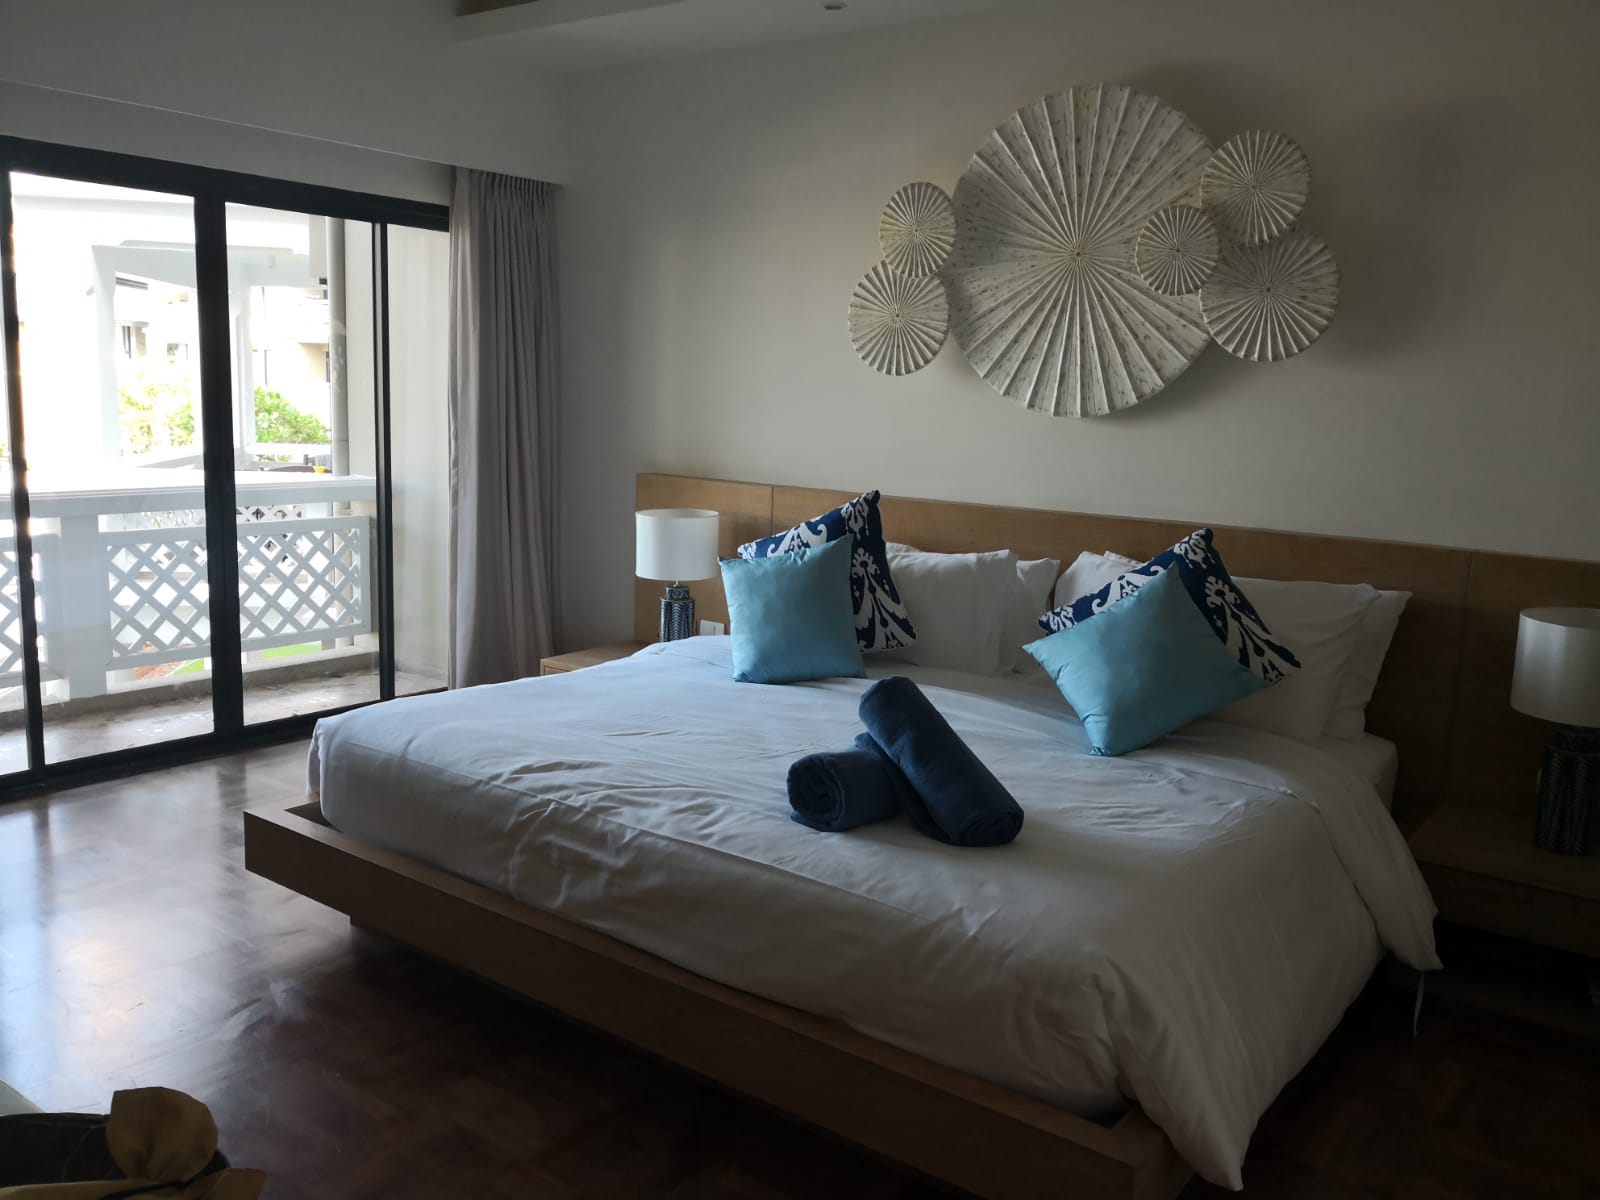 Allamanda 2 Bedroom-3dce888f-28f5-4d2f-a1e0-2c94b4e03e77.jpg